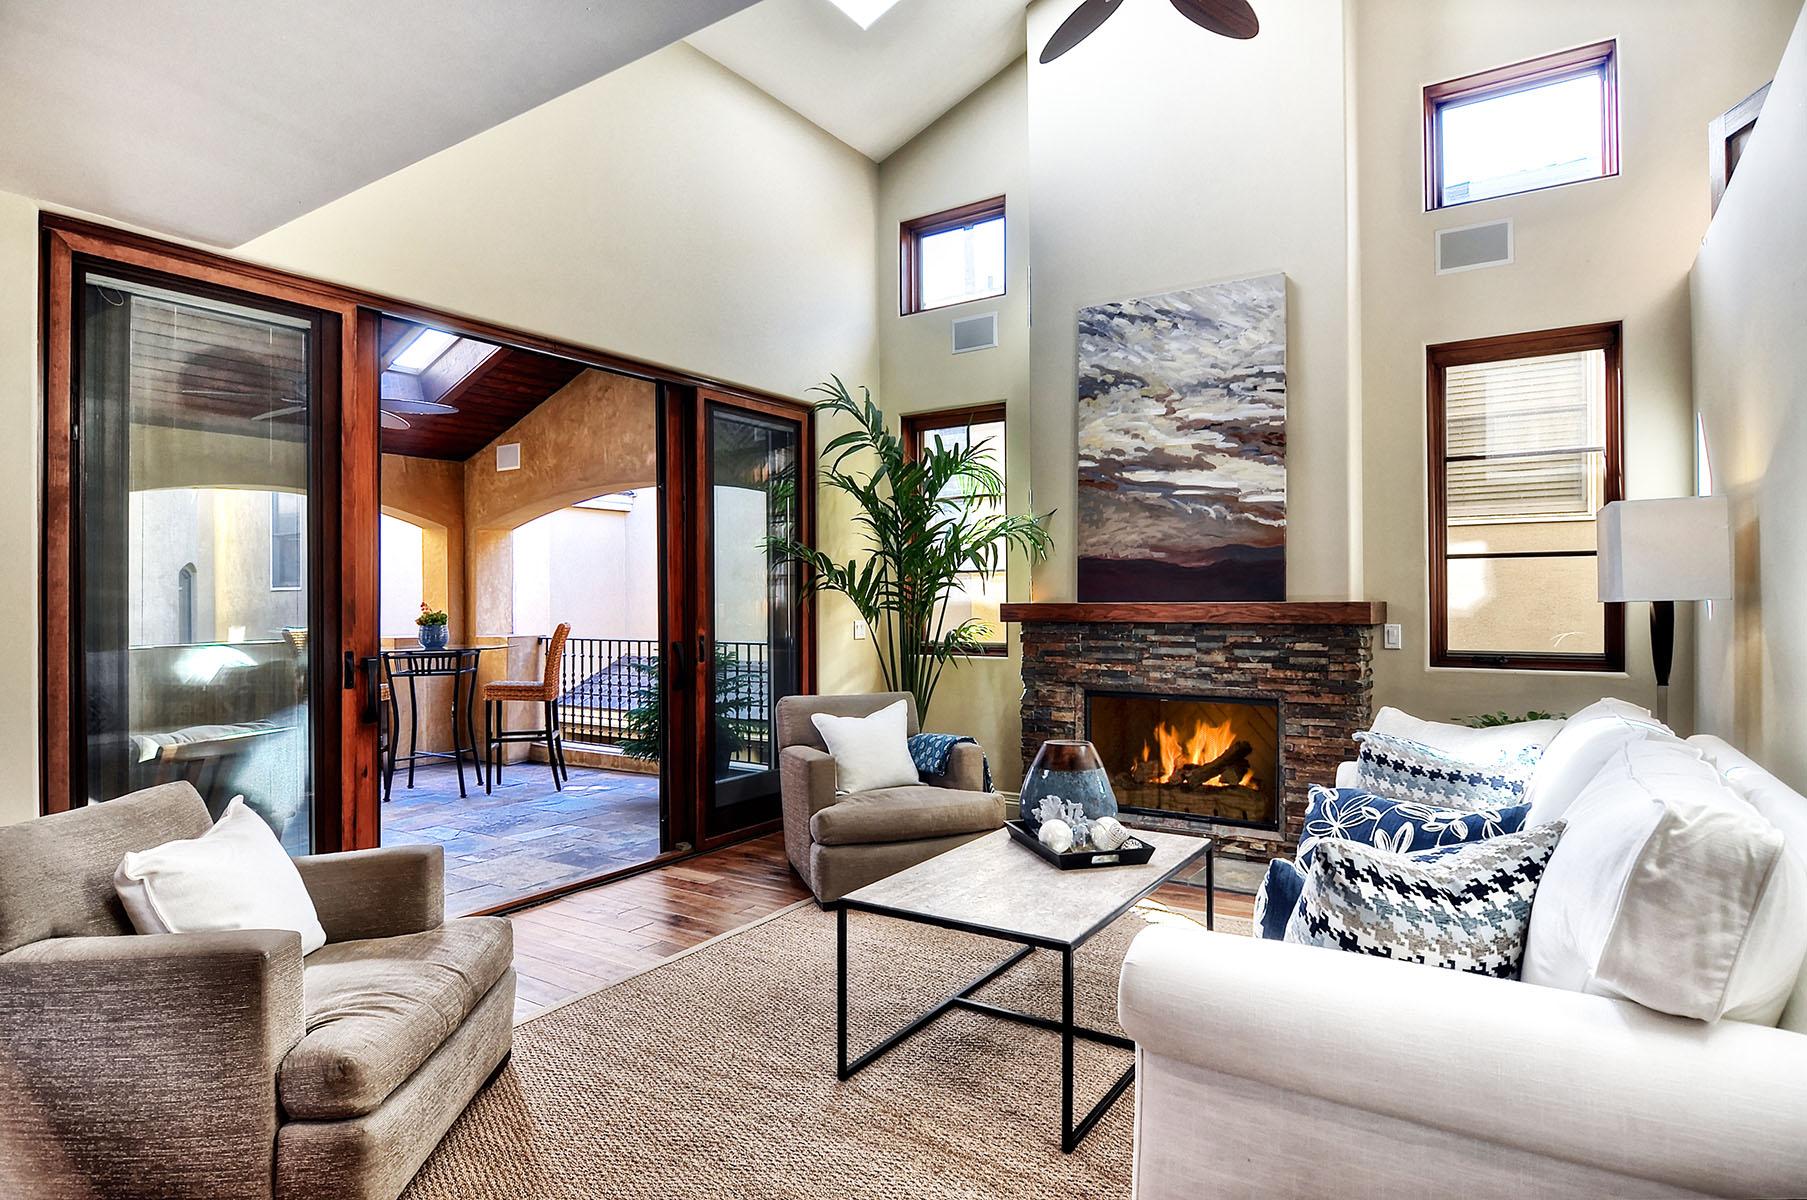 Condominium for Sale at 507 1/2 Goldenrod Ave 507 Goldenrod Ave 1/2 Corona Del Mar, California 92625 United States